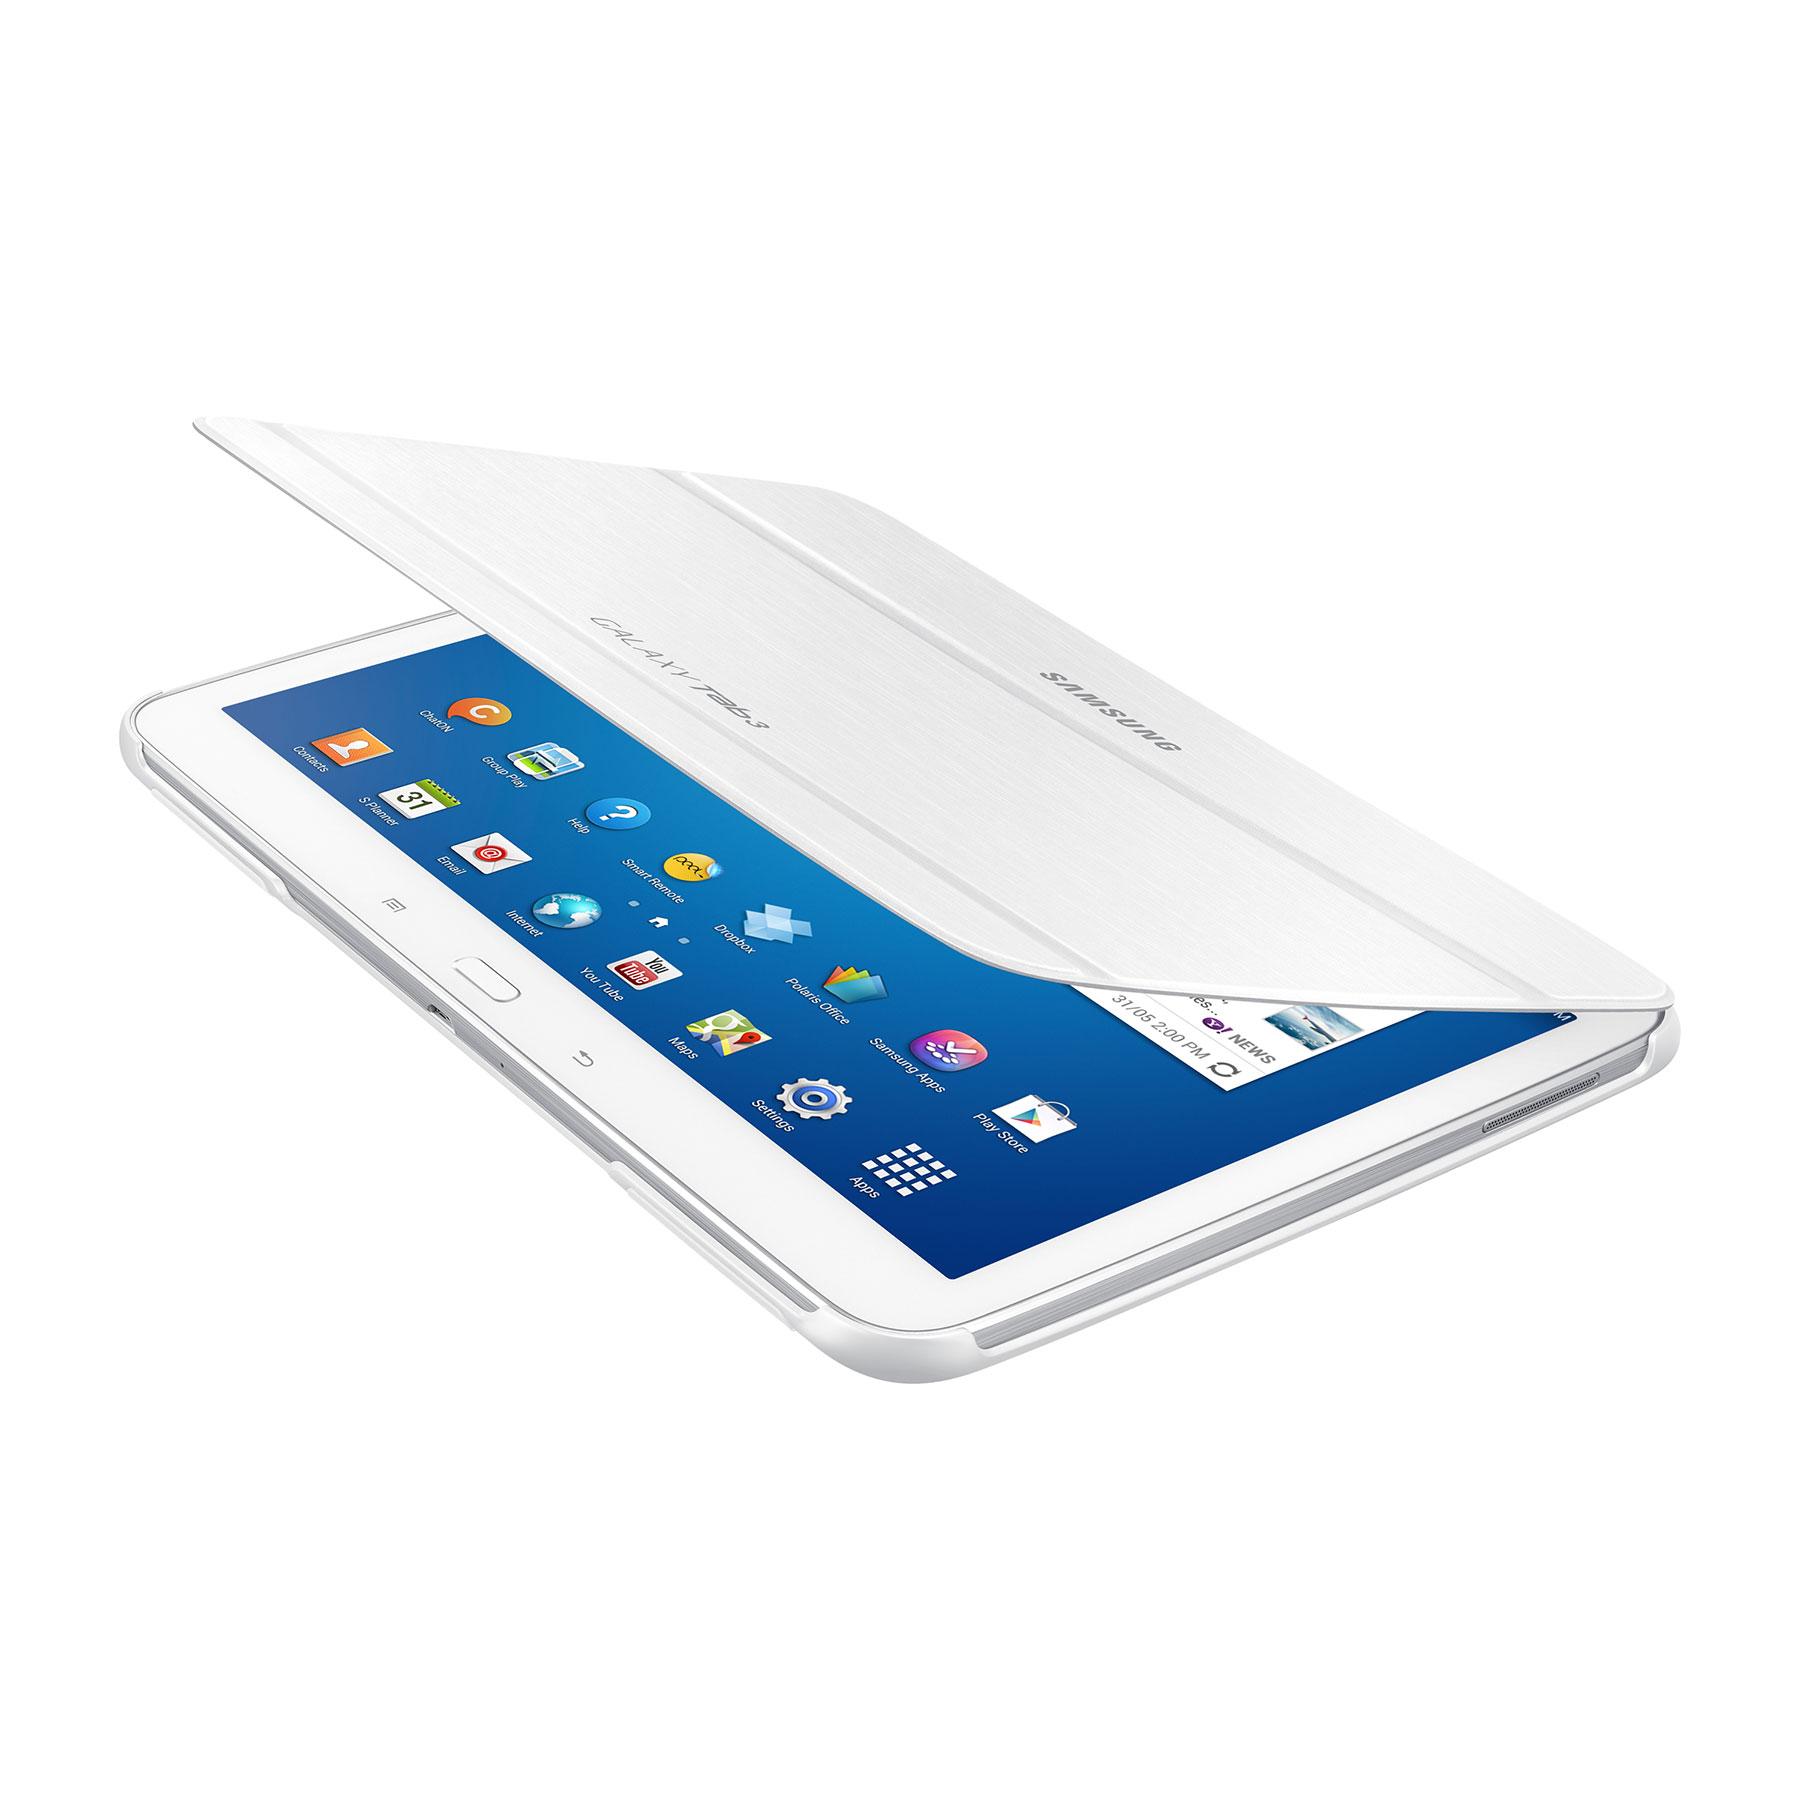 "Accessoires Tablette Samsung Cover EF-BP520B White (pour Samsung Galaxy Tab 3 10.1"") Etui rabat pour Samsung Galaxy Tab 3 10.1"""